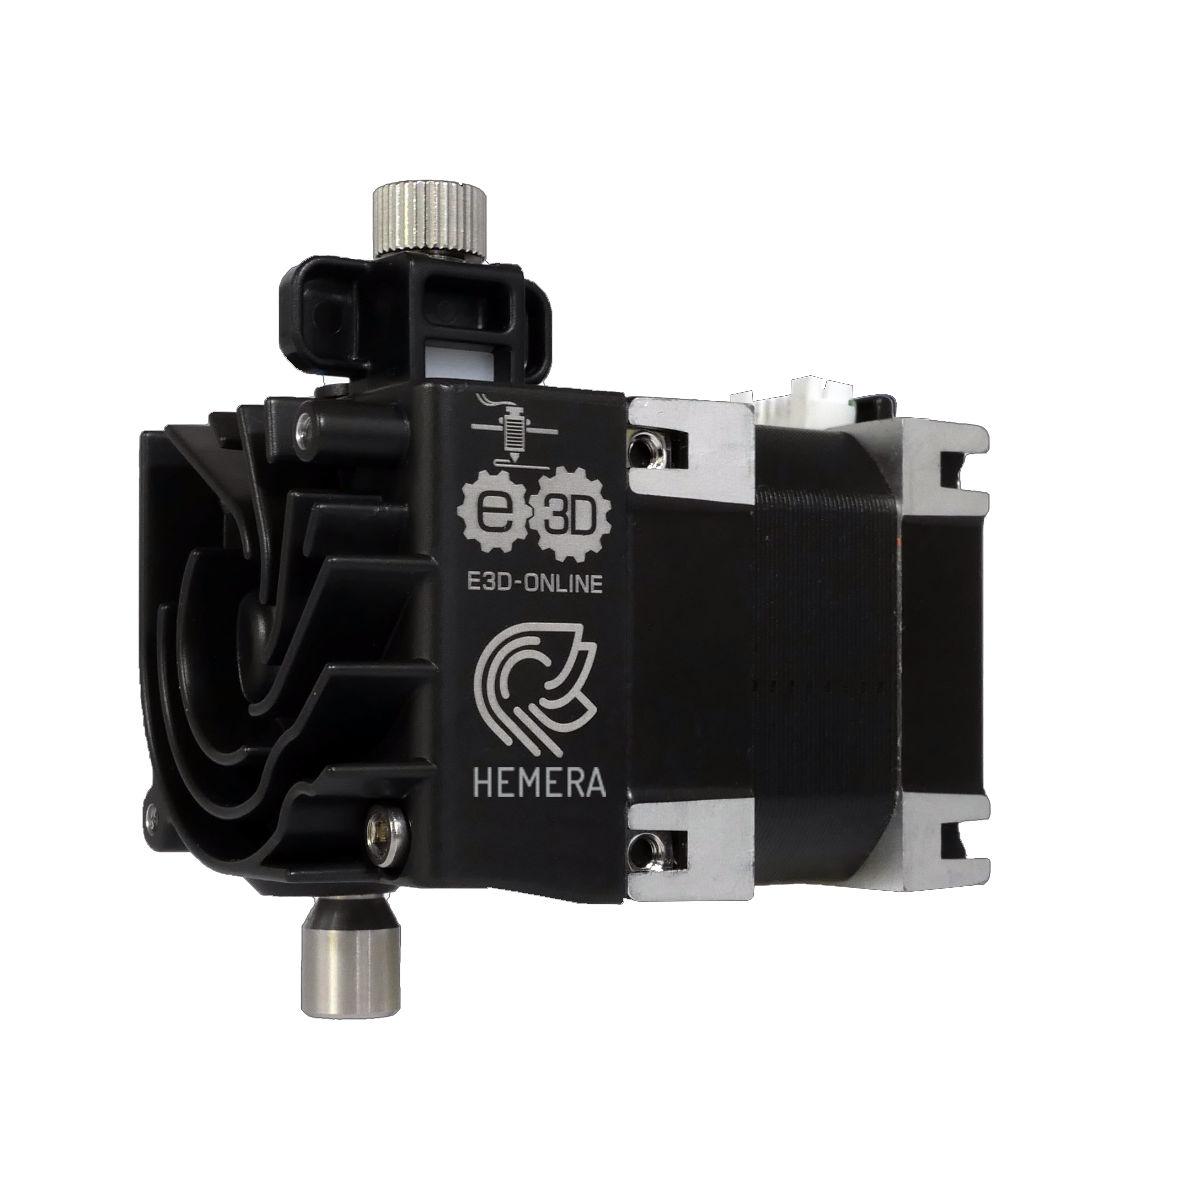 E3D Hemera Bowden Extruder Kit - 3D Printer Spare Parts